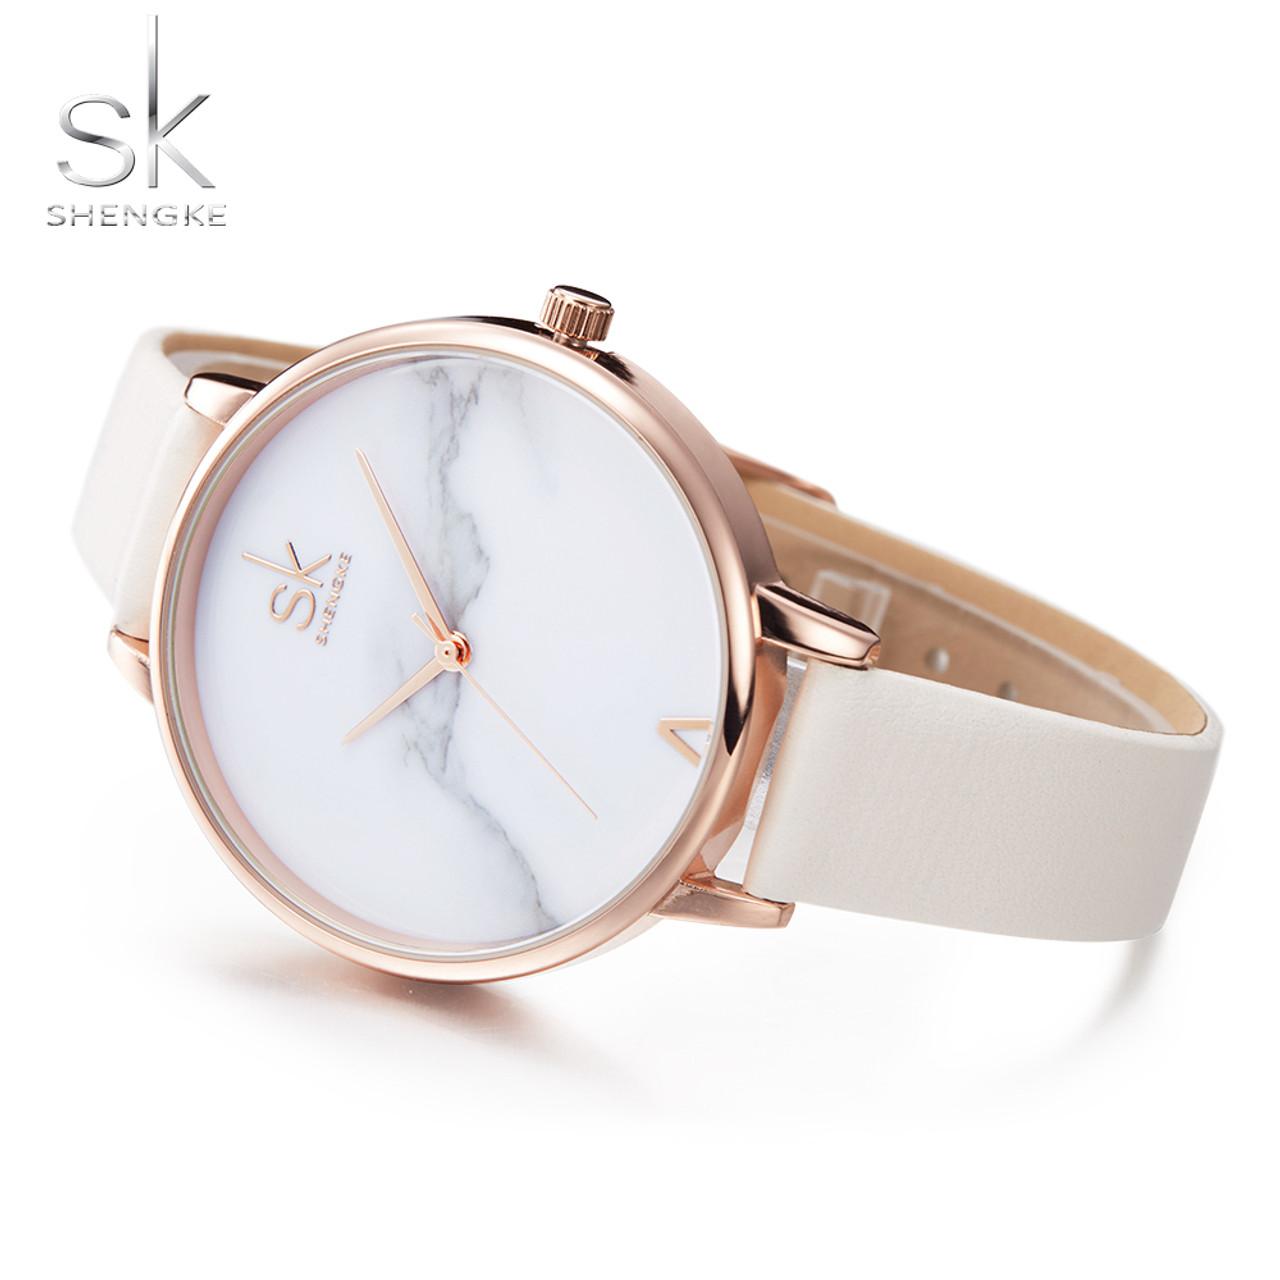 13232b634 ... Shengke Fashion Women Watches Elegant Female Wrist Watches White Leather  Watches Quartz Clock Montre Femme Marble ...